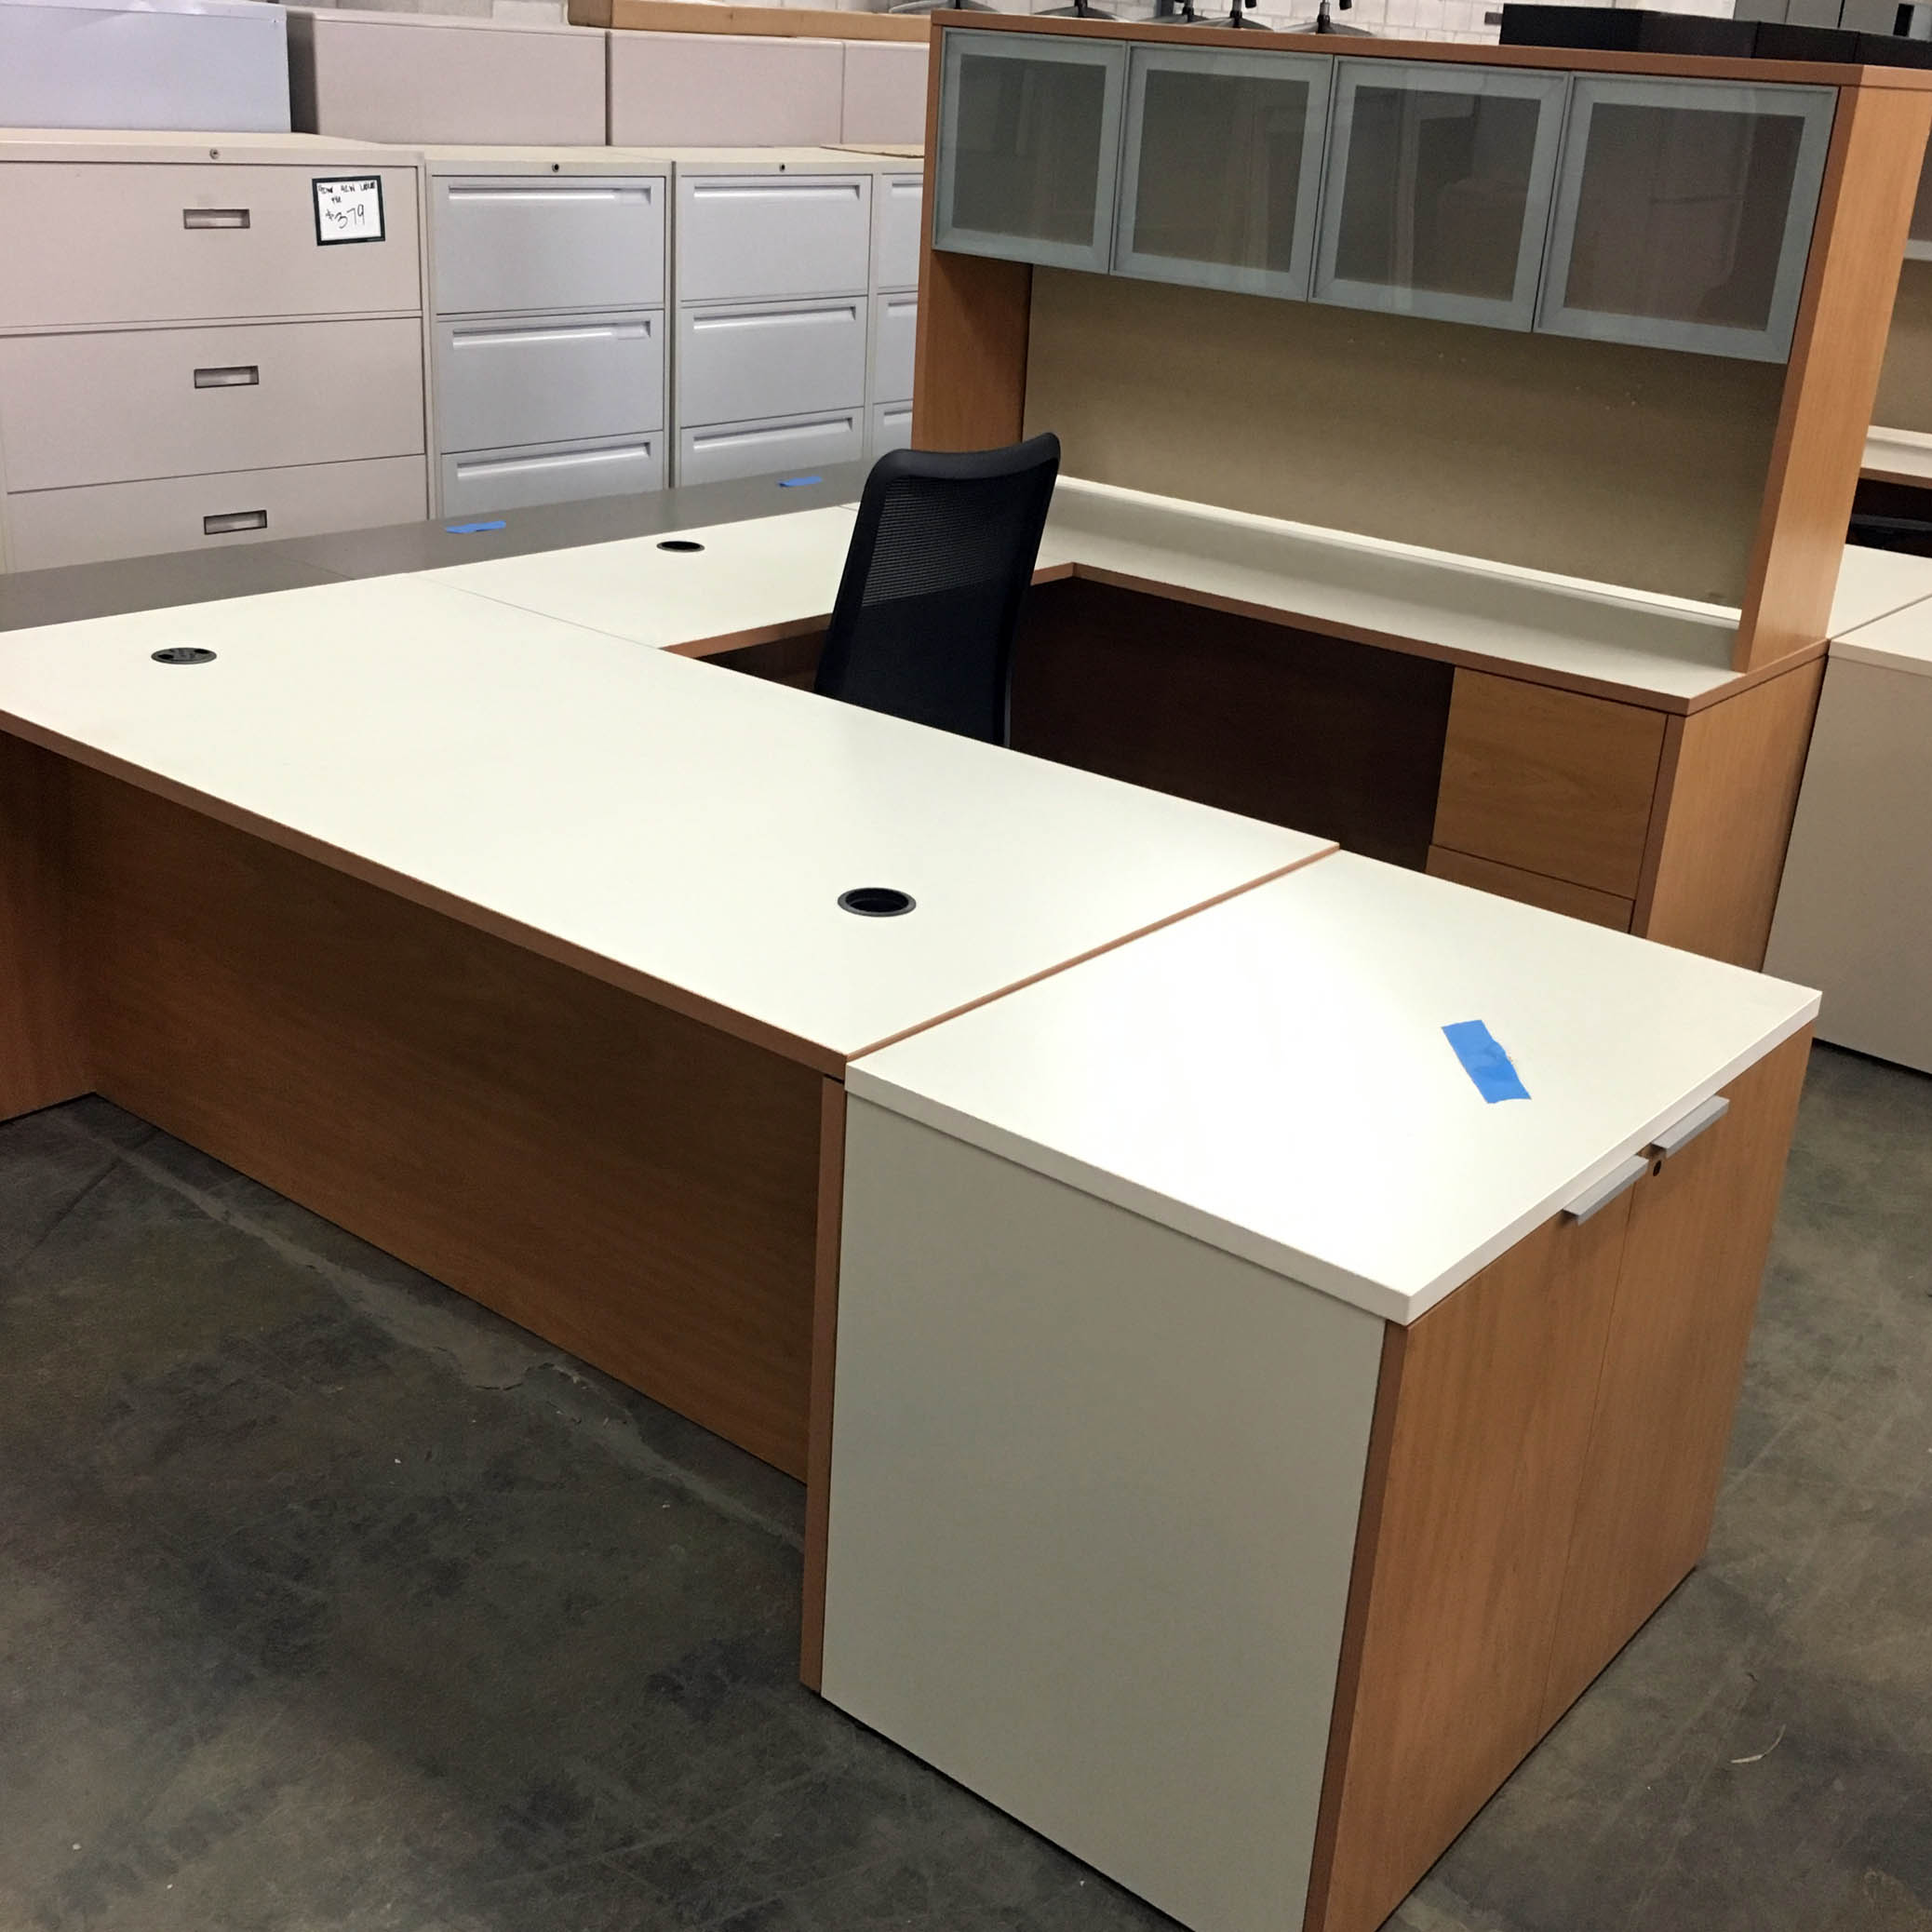 hon 10500 series u-shape desk | arthur p. o'hara